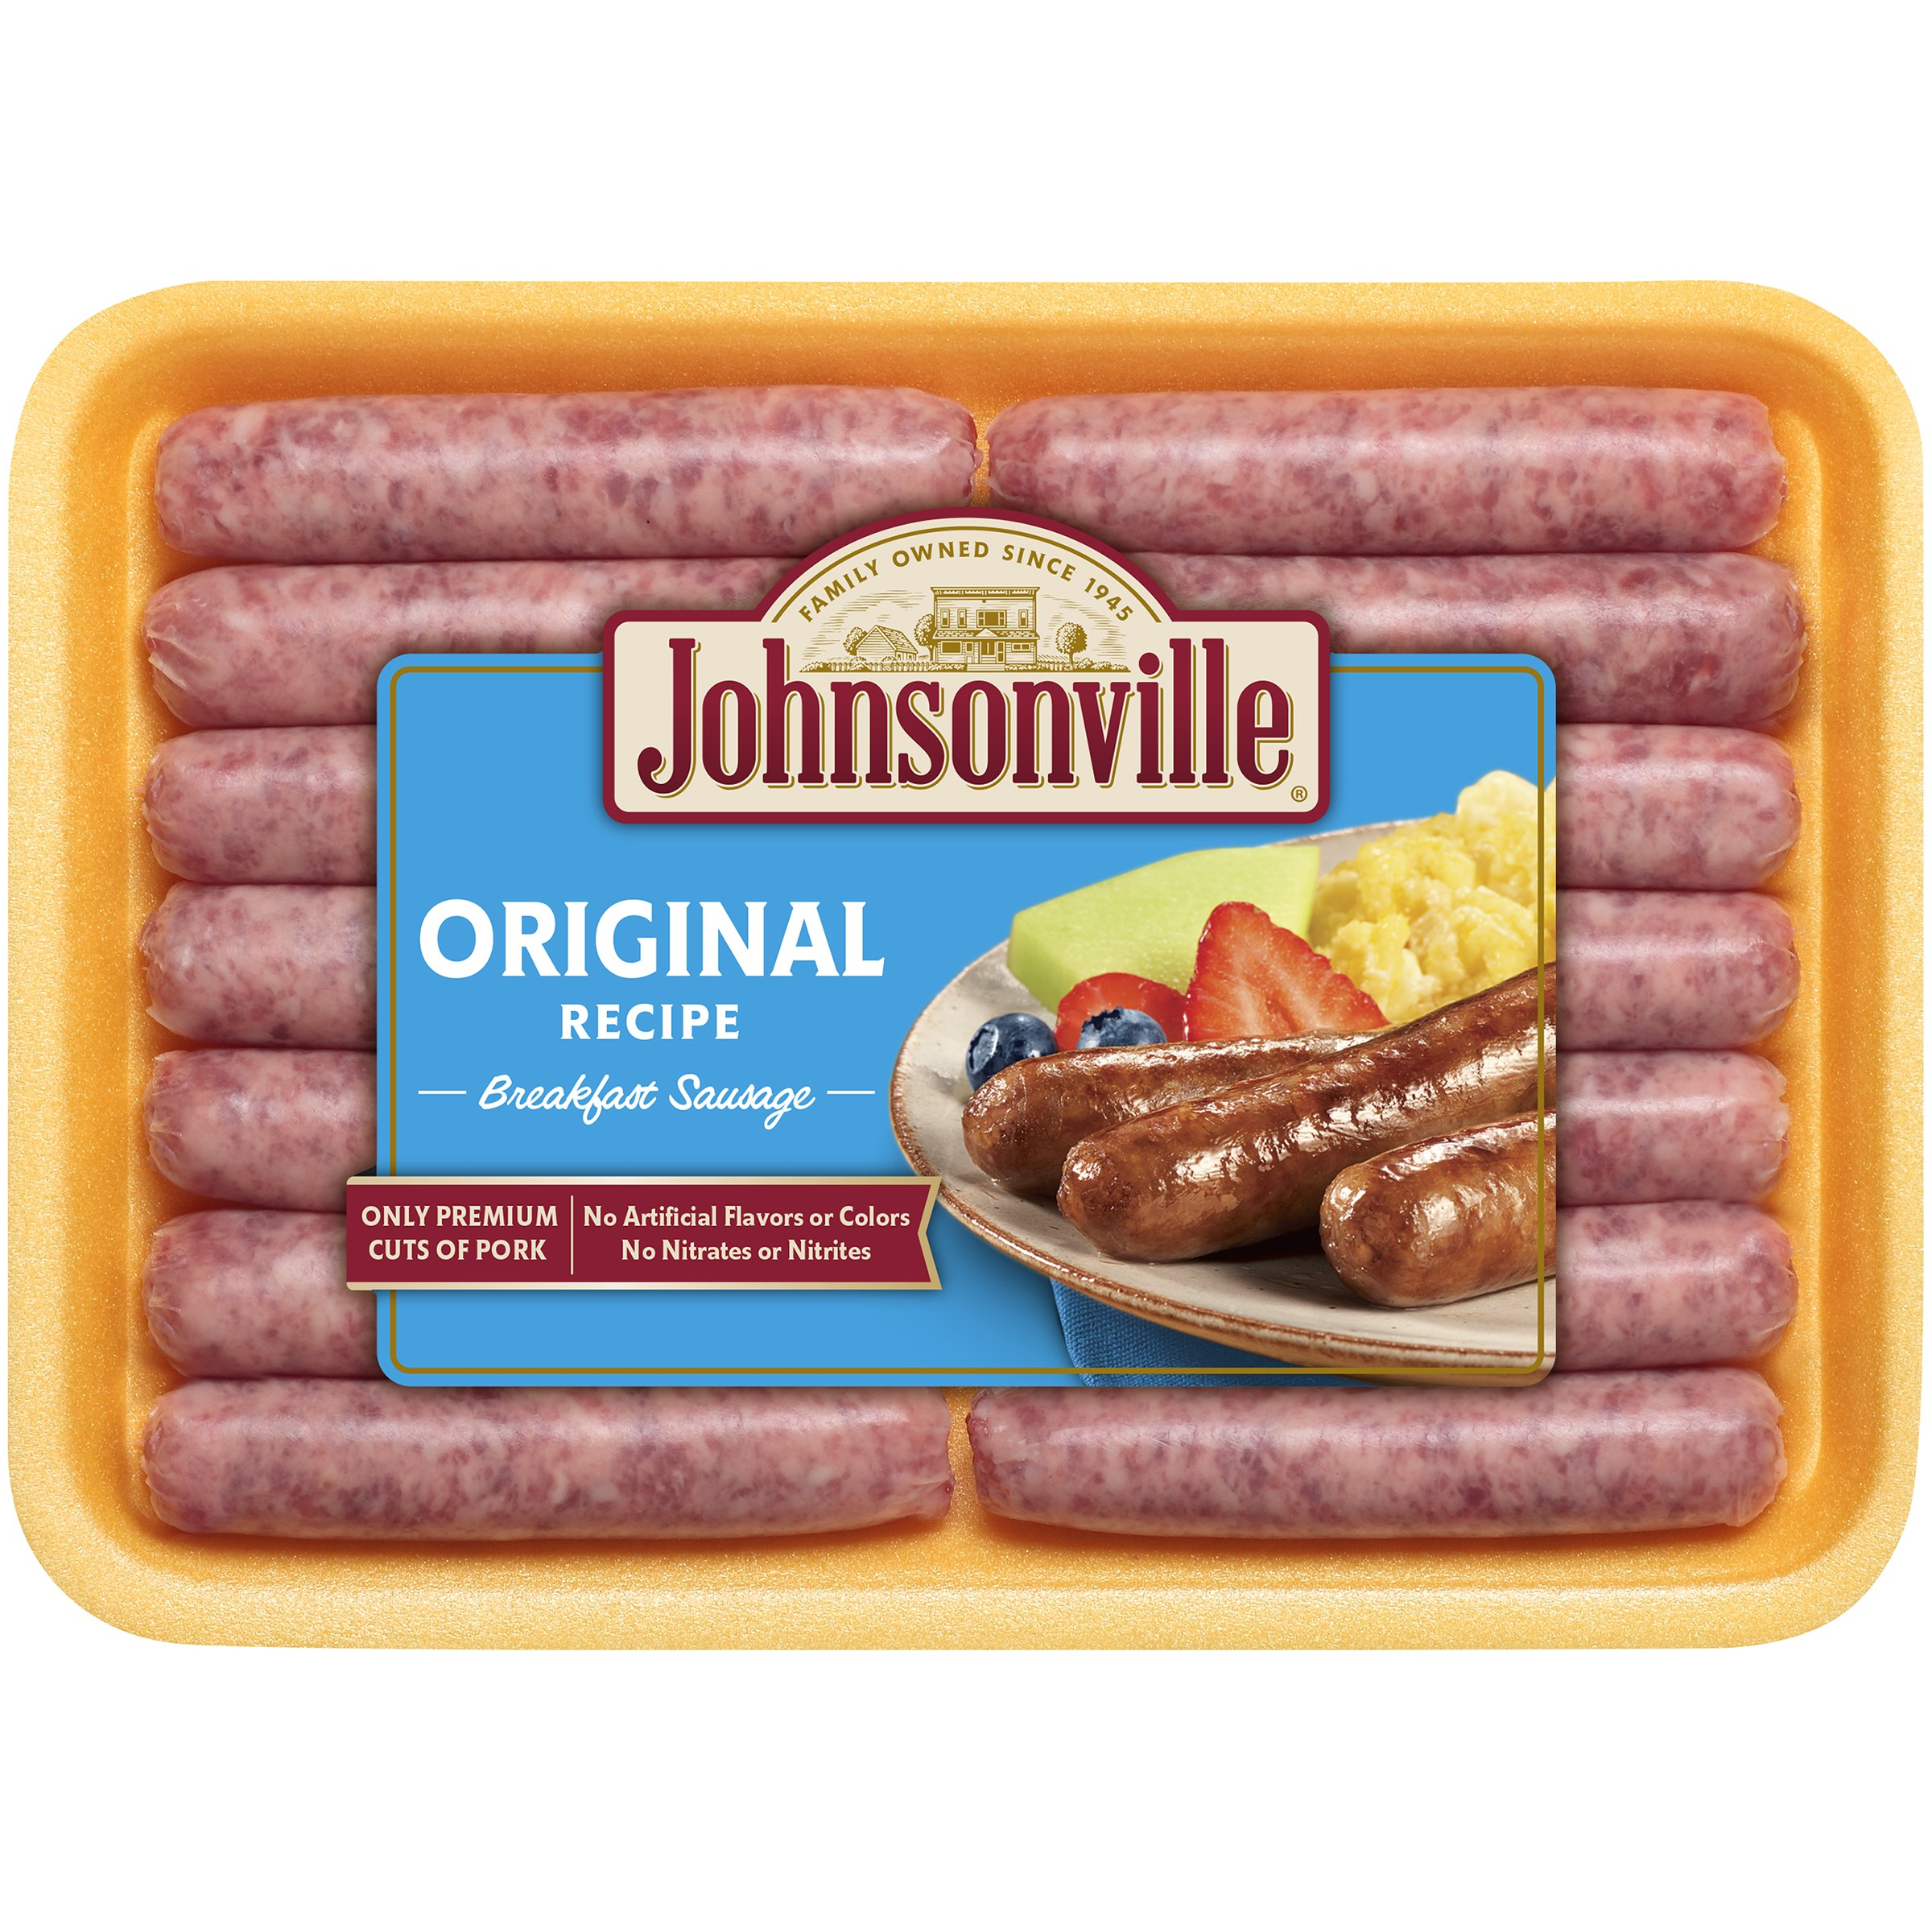 Johnsonville Original Breakfast Links 12oz tray  (100330, 100336, 100342, 100742, 100324)